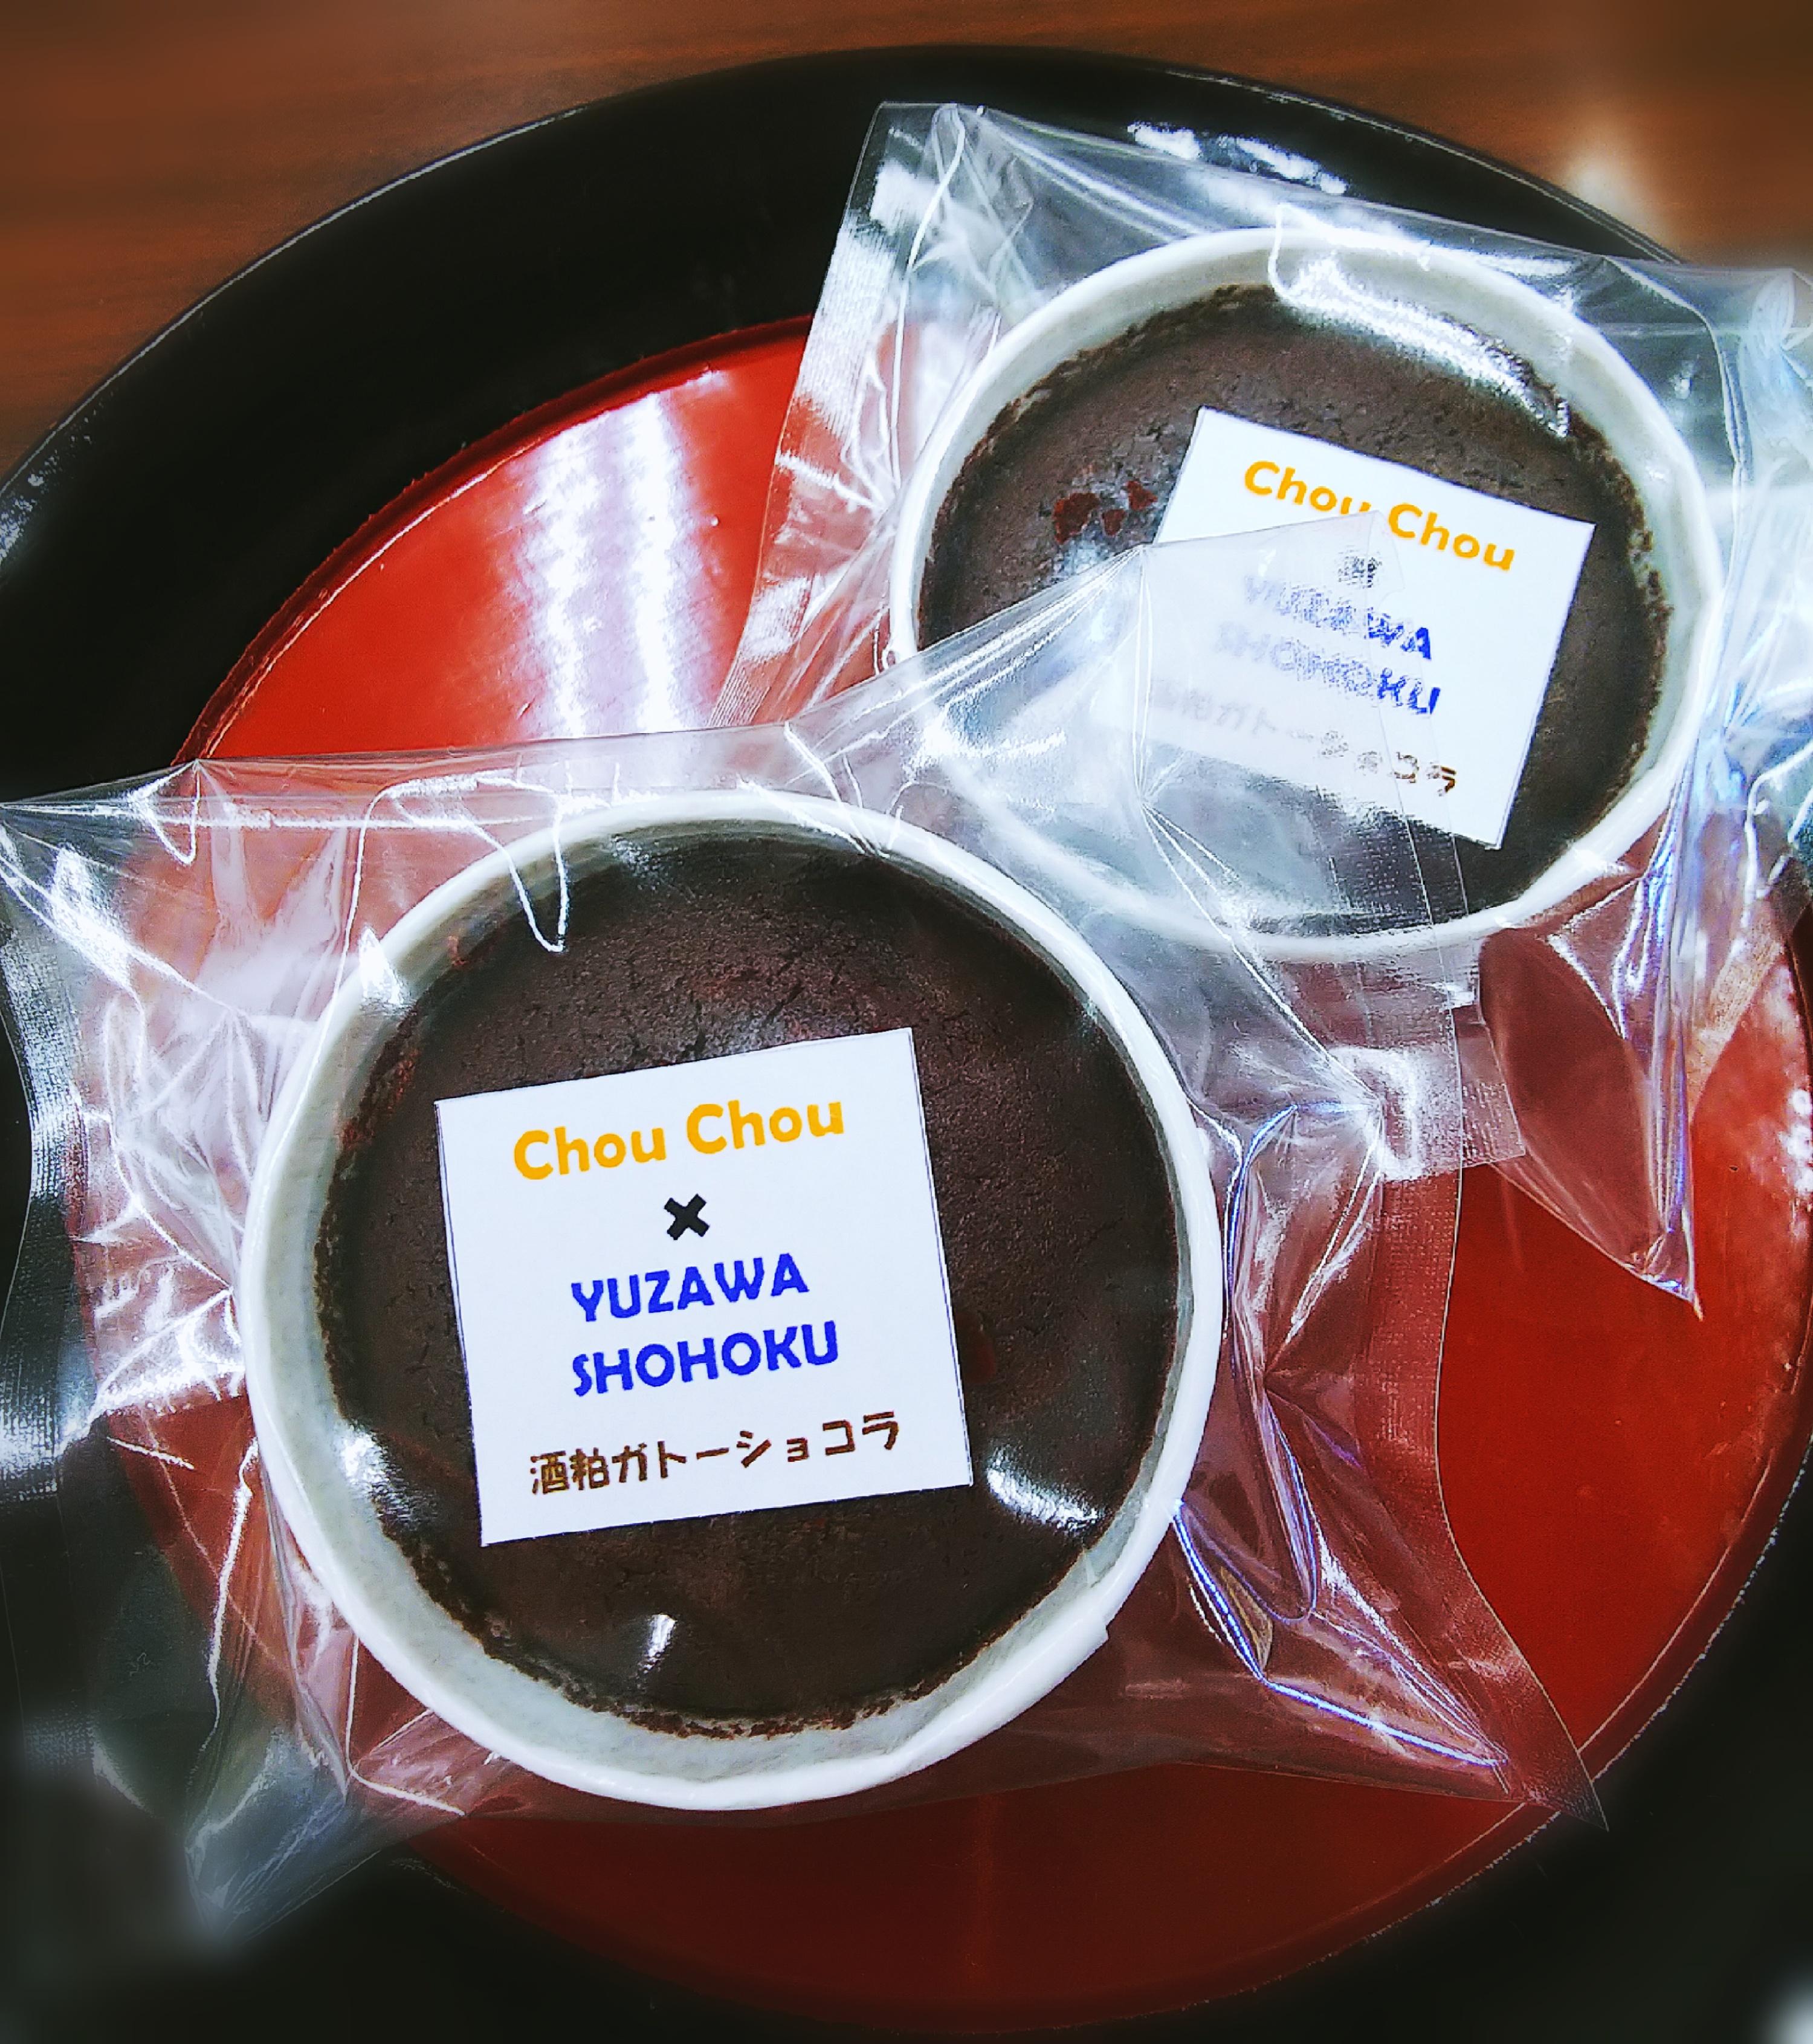 http://www.fukukomachi.com/blog/photo/C360_20210819-131341-90.jpg